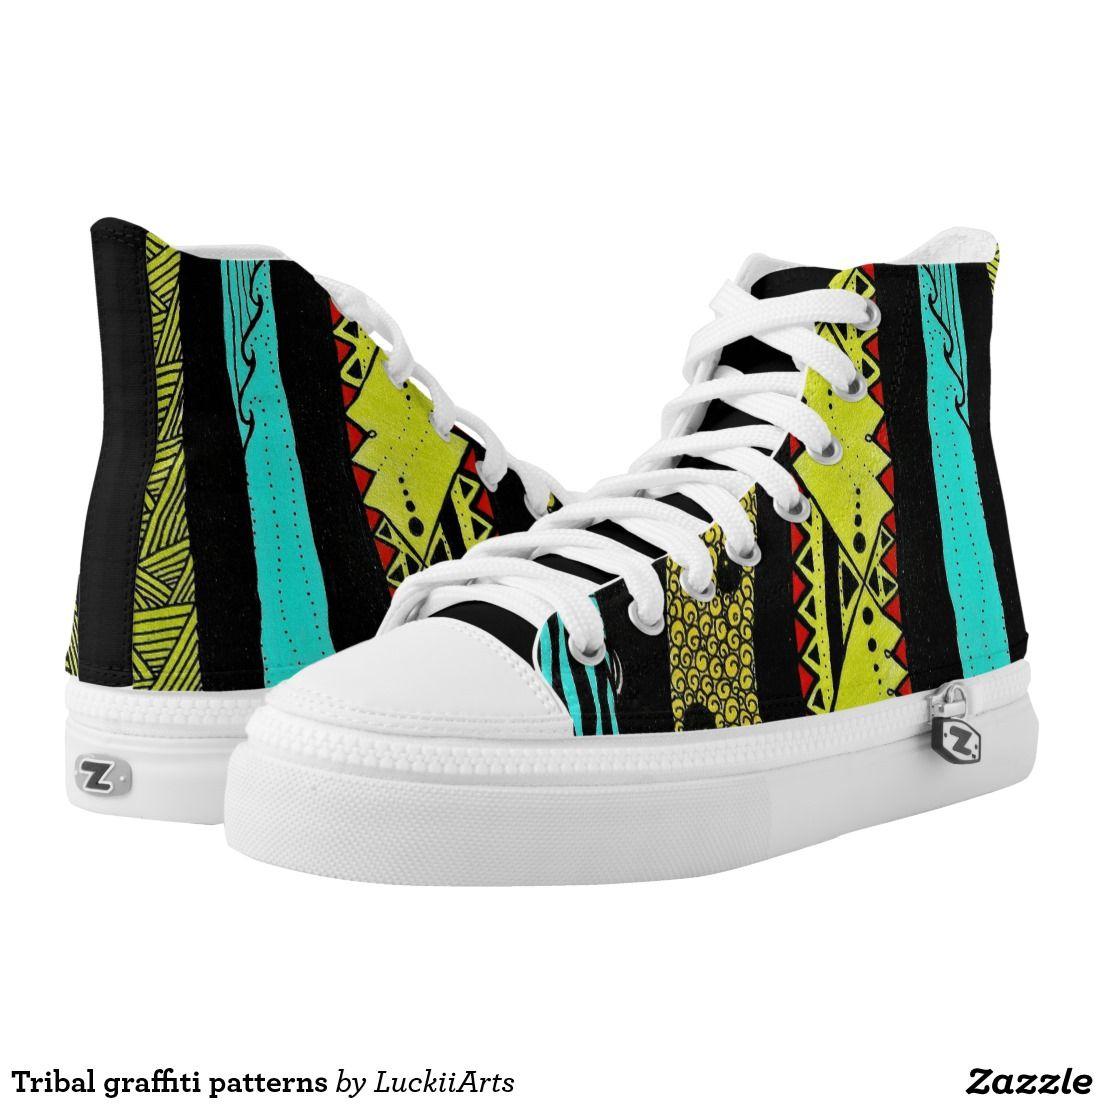 Tribal graffiti patterns printed shoes